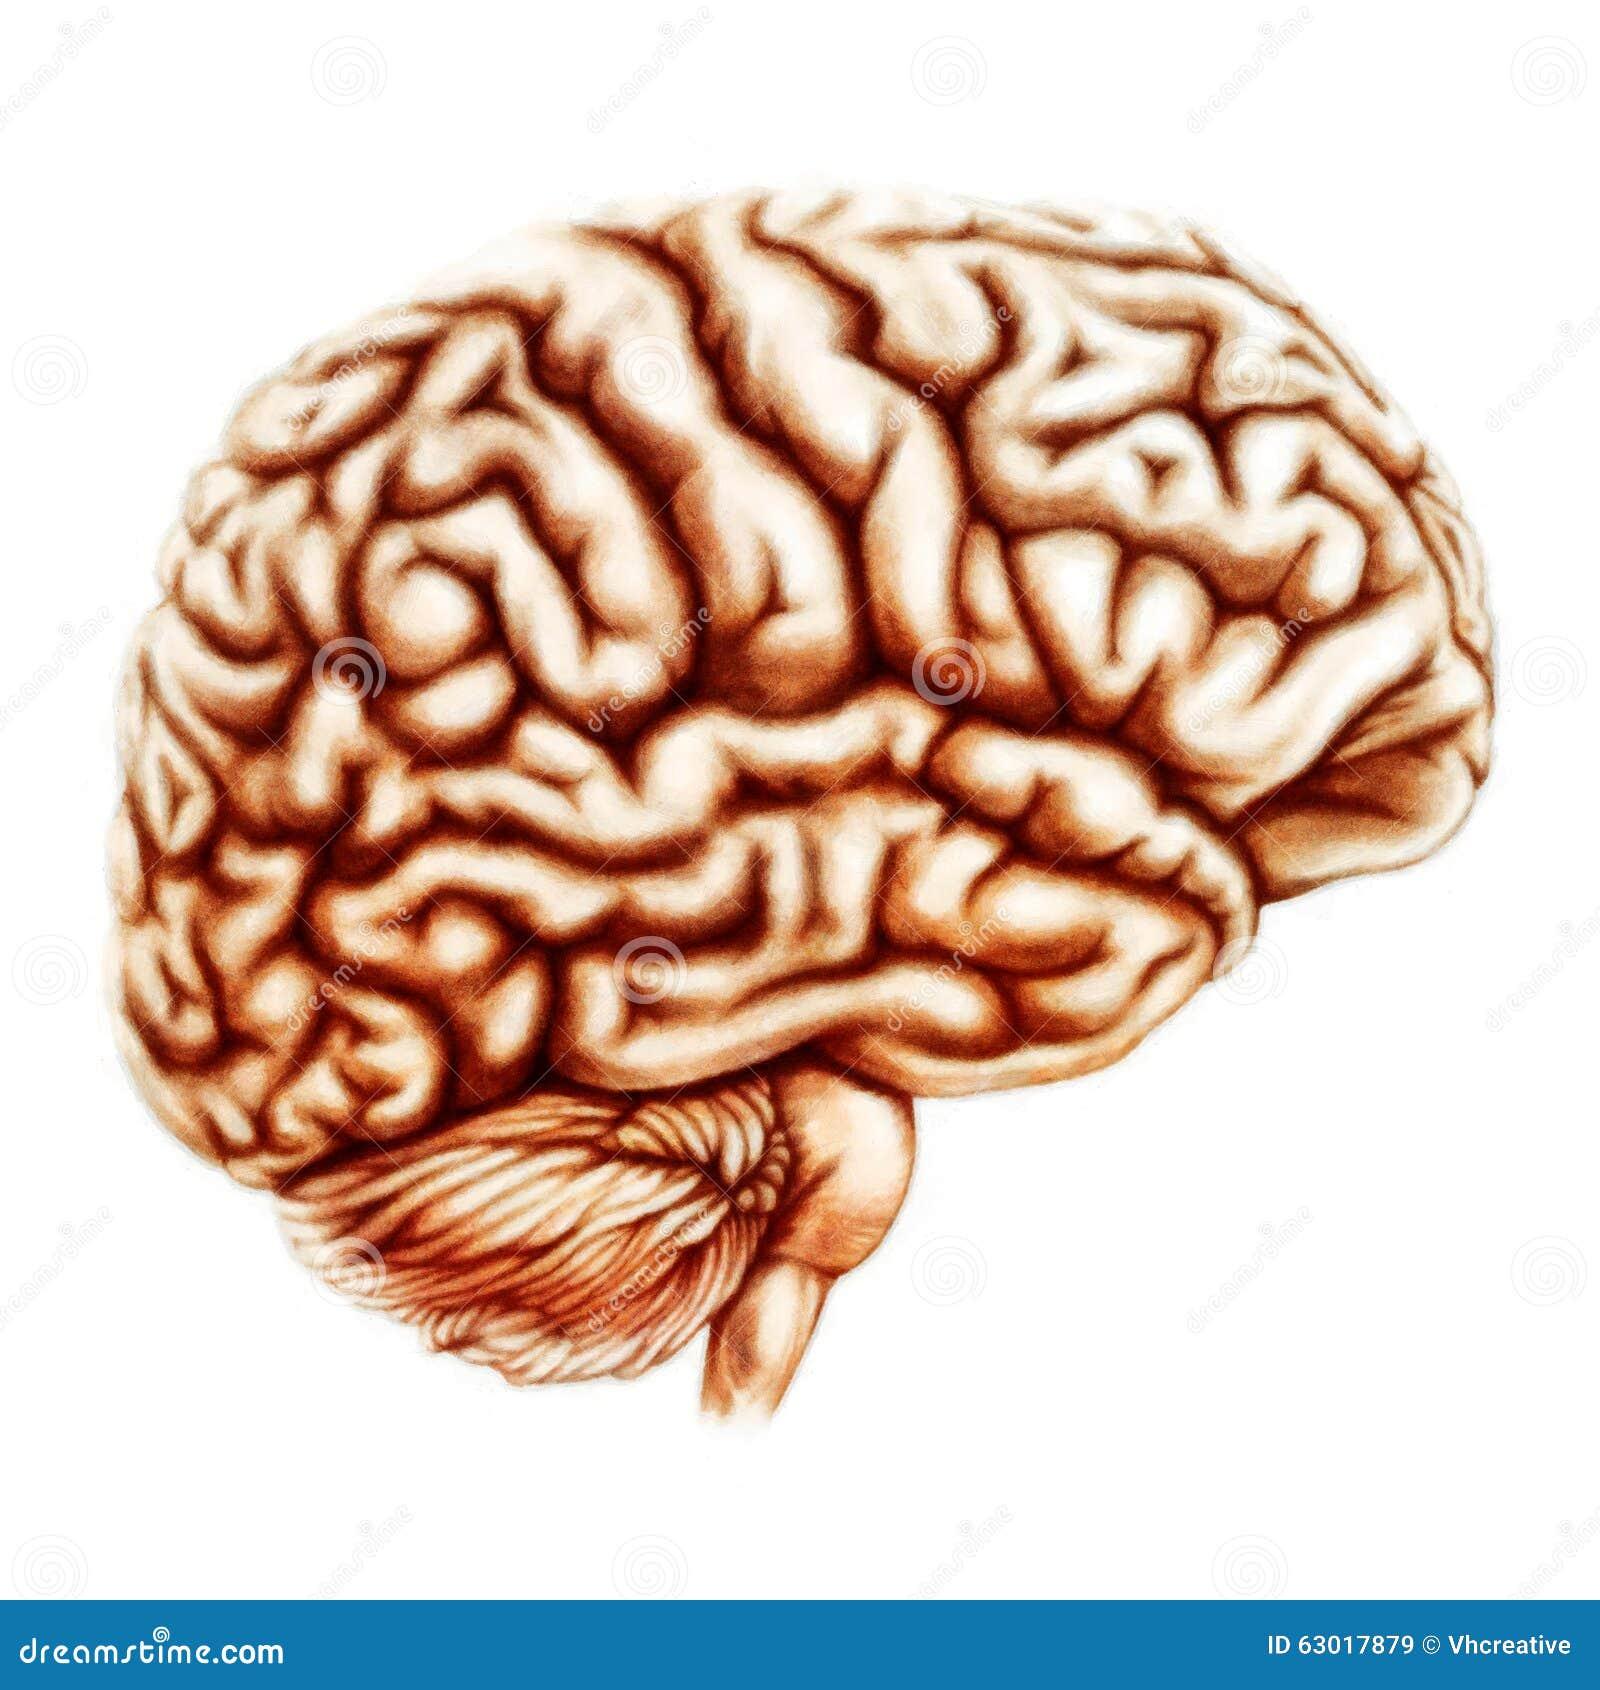 Essere umano Brain Anatomy Illustration